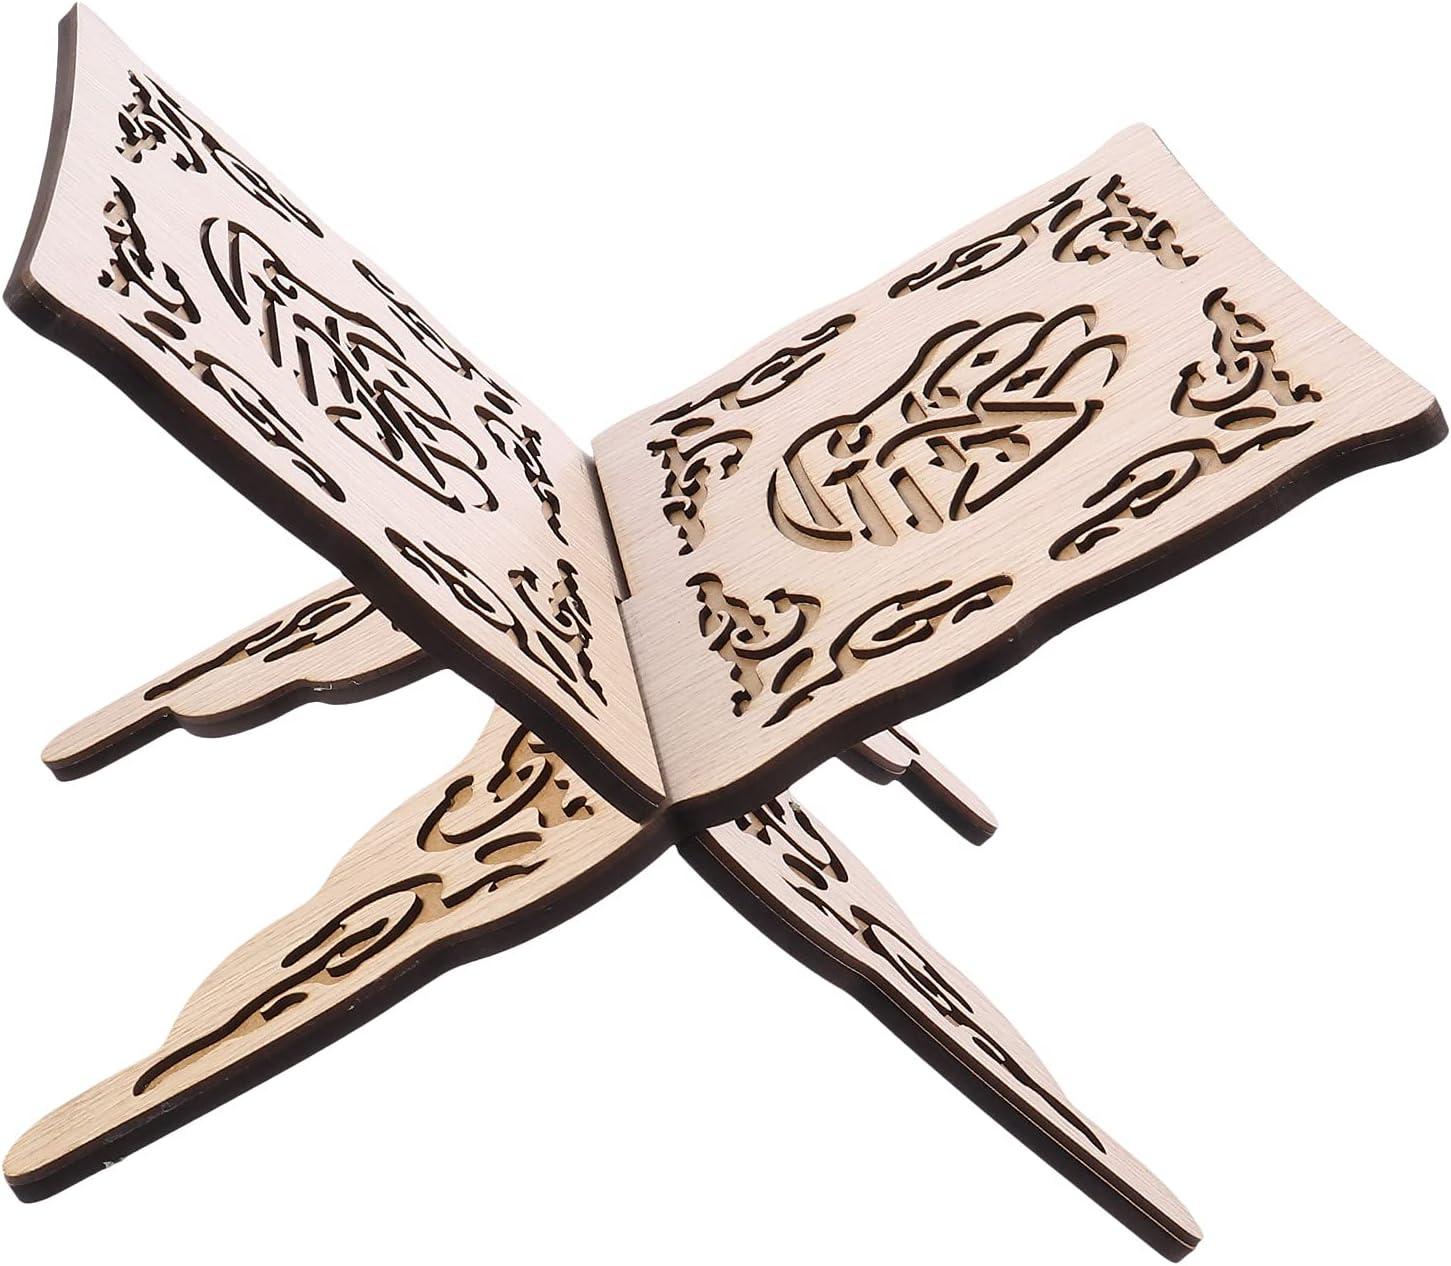 Abaodam Wooden Muslim Book Holder Stand Bookshelf Prayer Book Ho